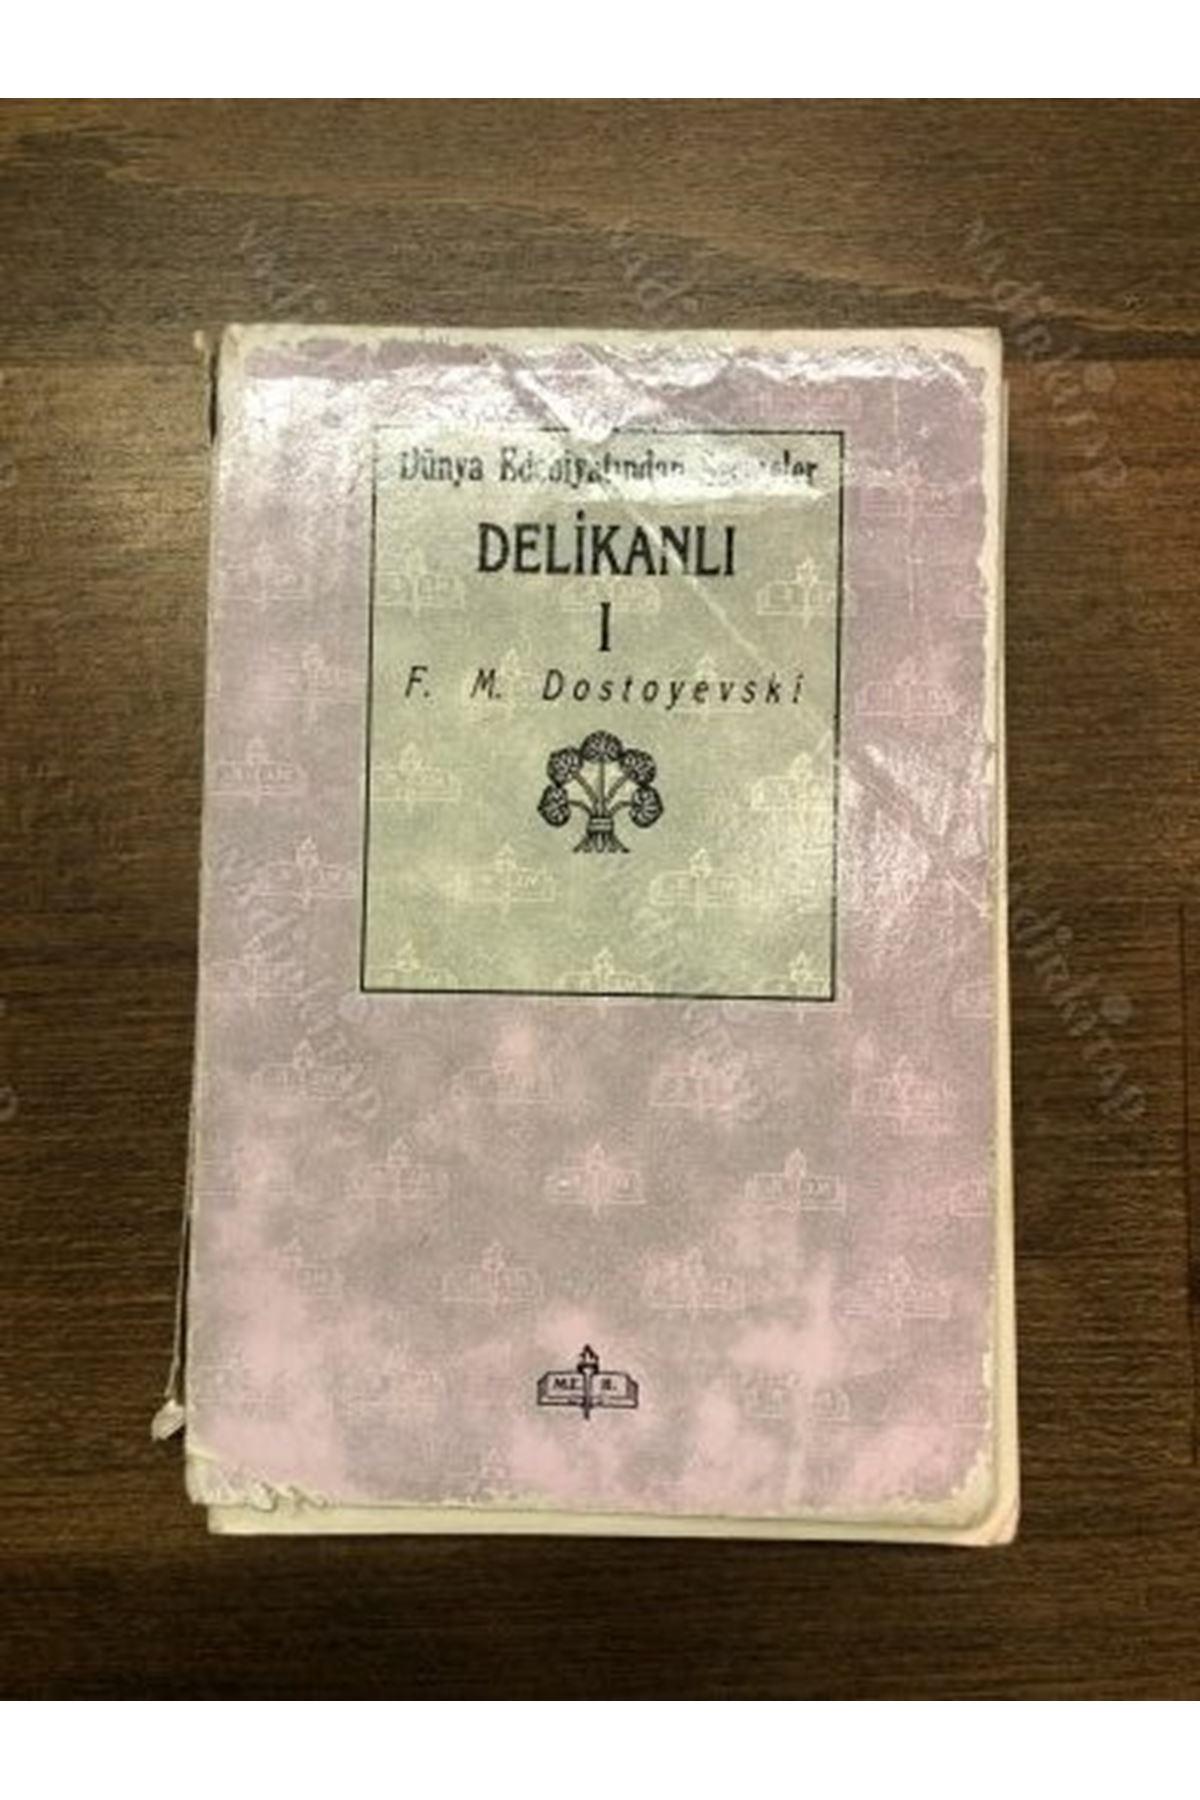 DOSTOYEVSKİ - DELİKANLI 1